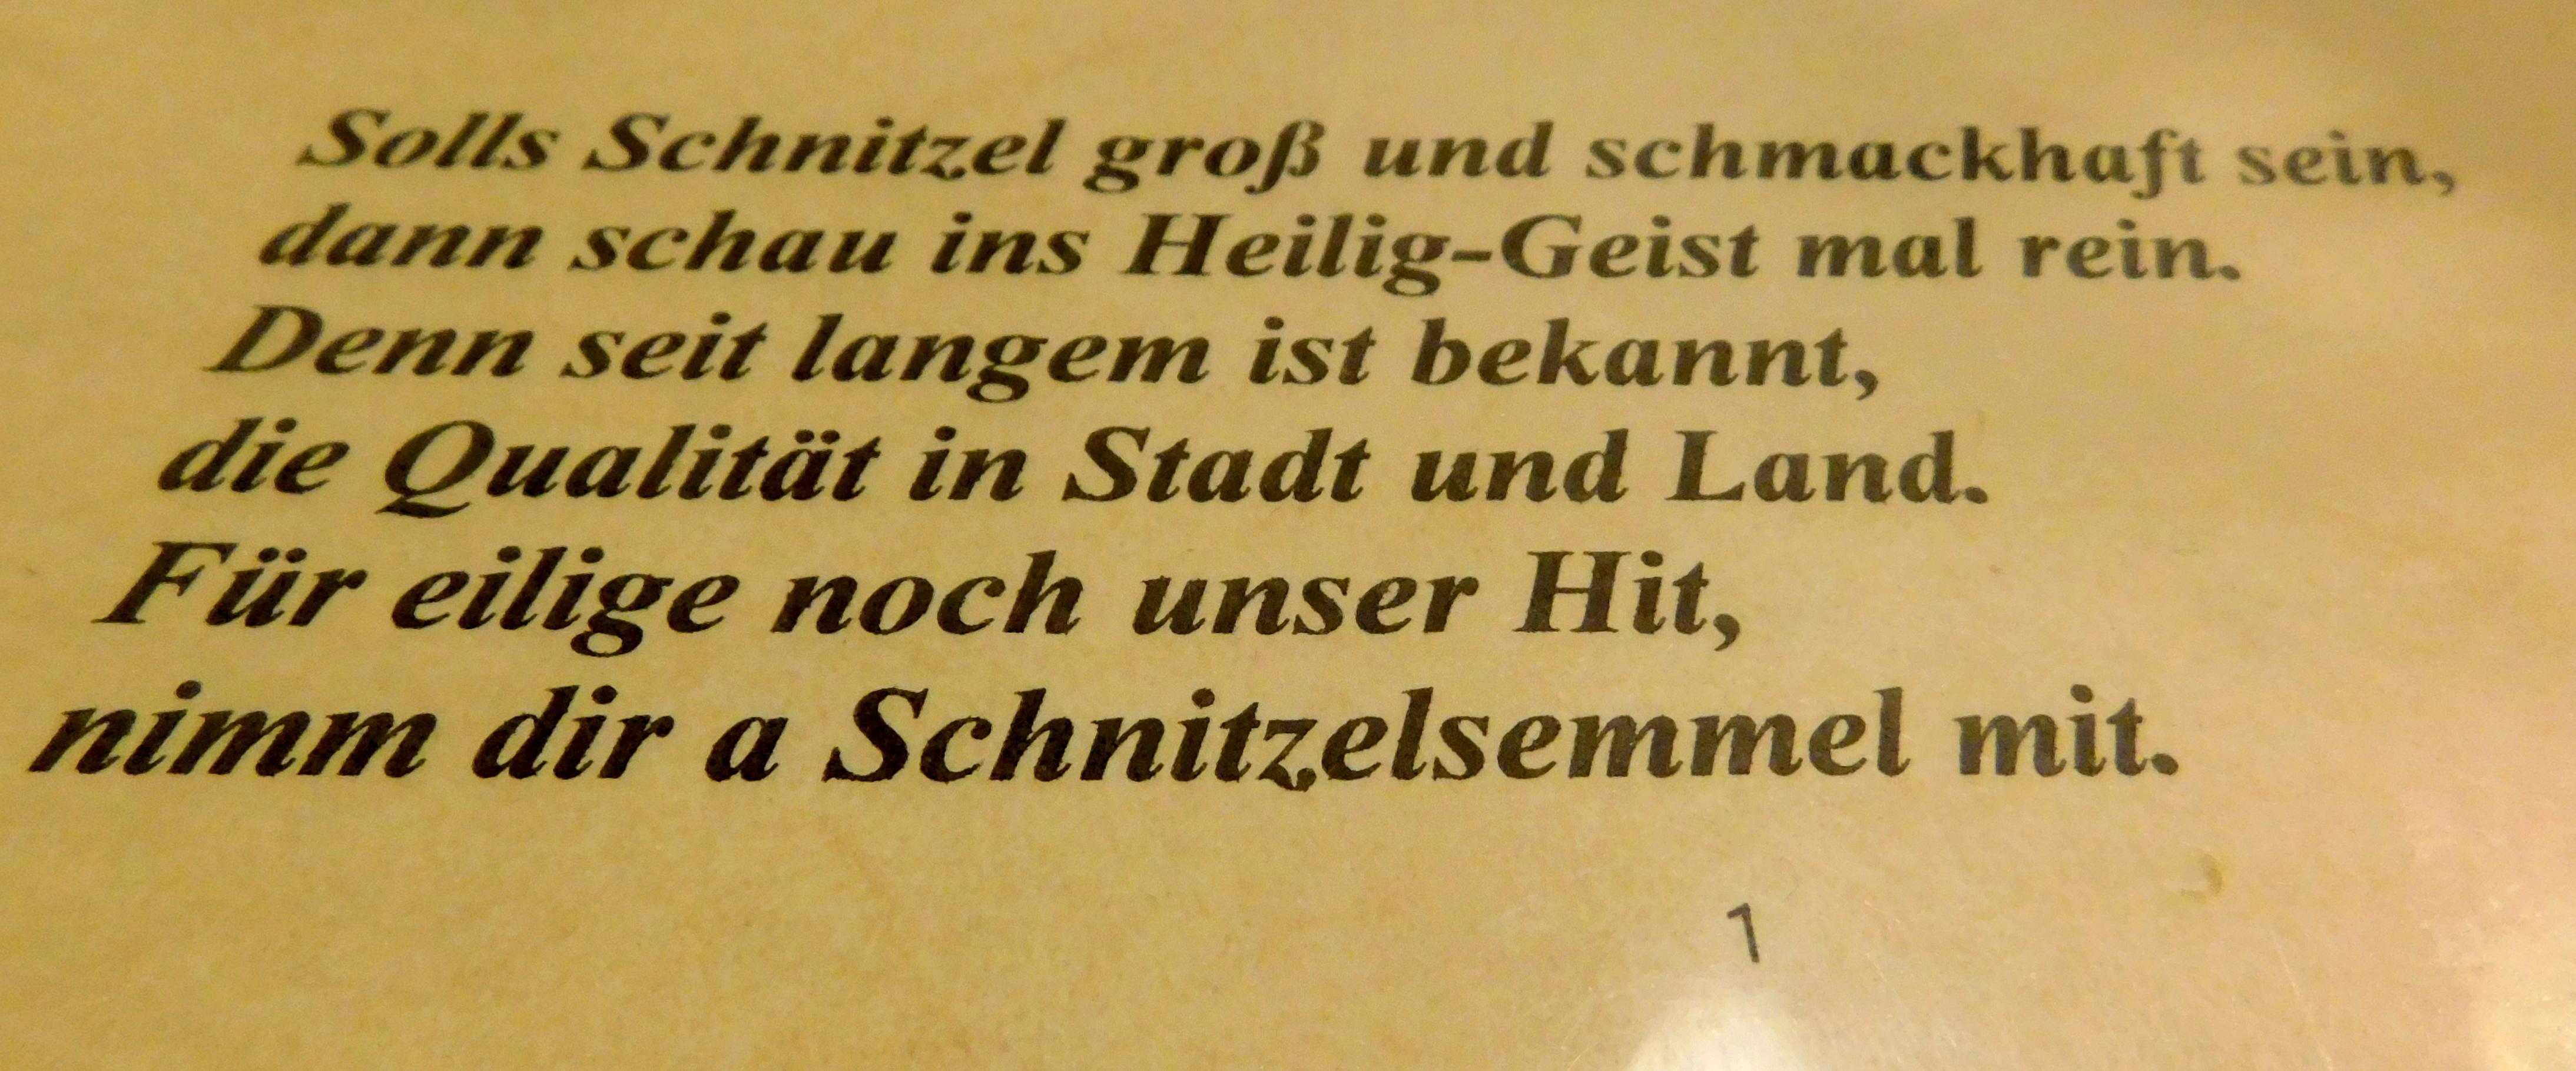 morala șnitzel în bavaria